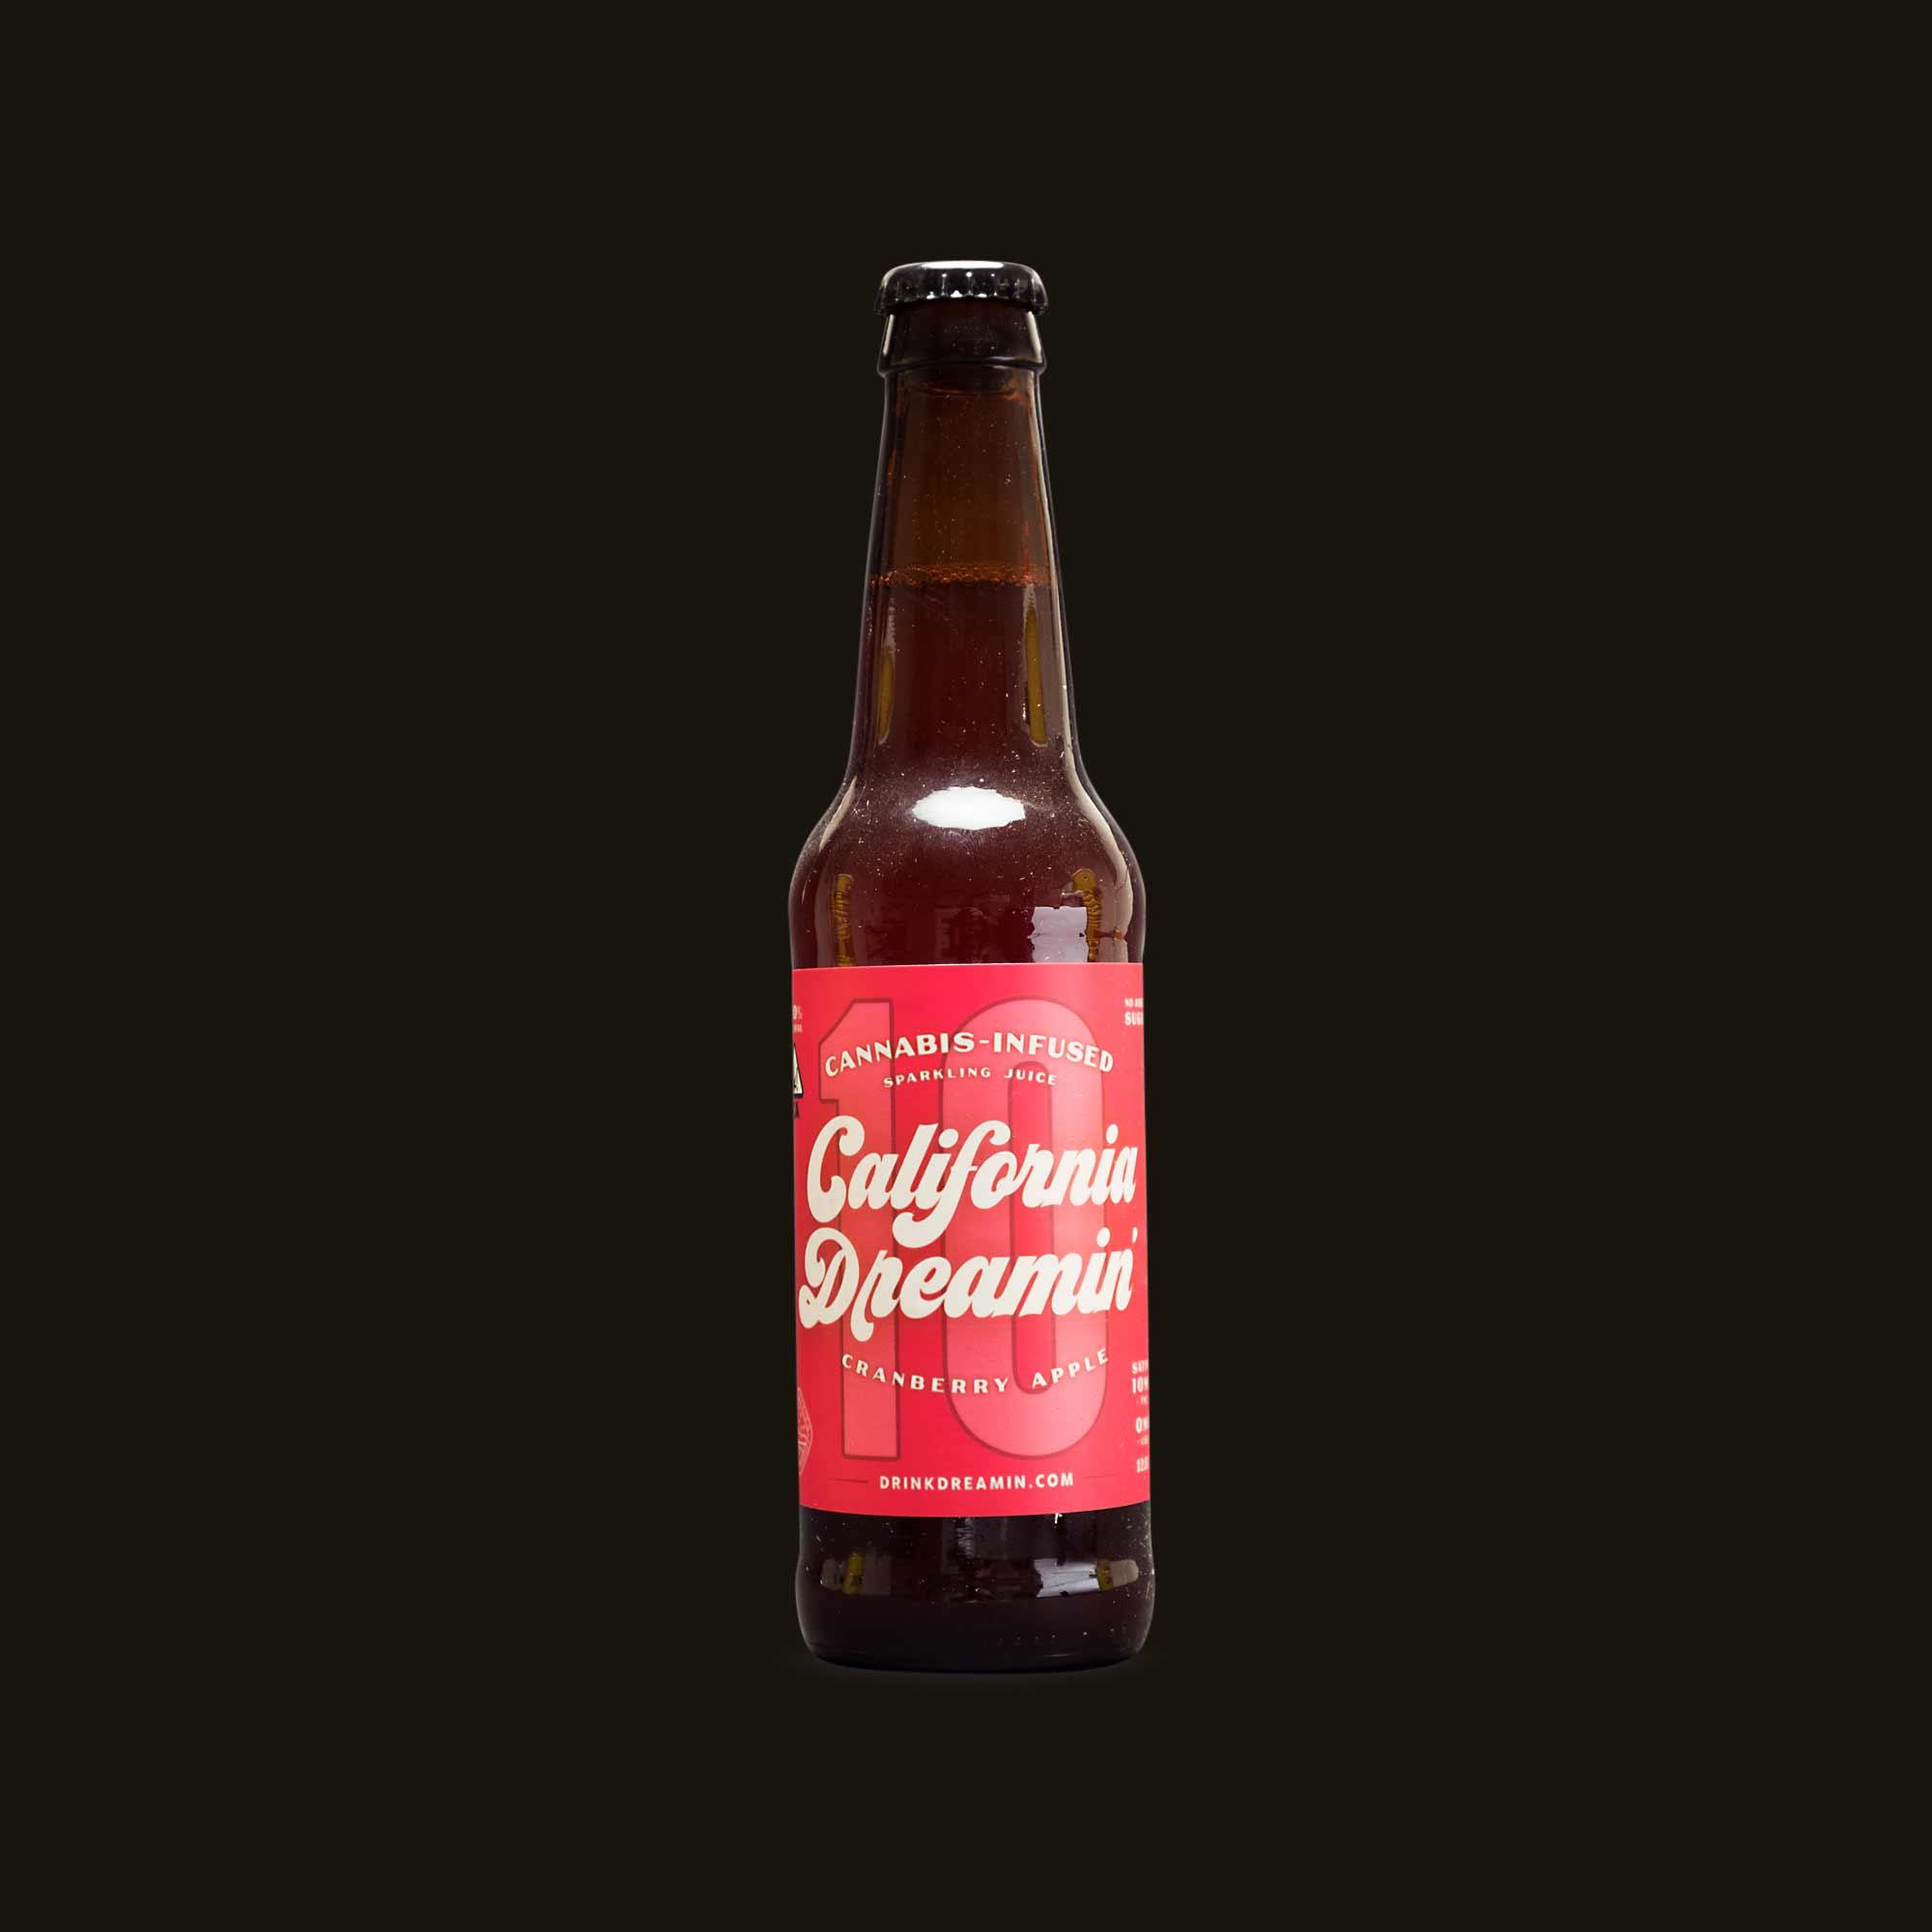 California Dreamin' Cranberry Apple Sparkling Juice